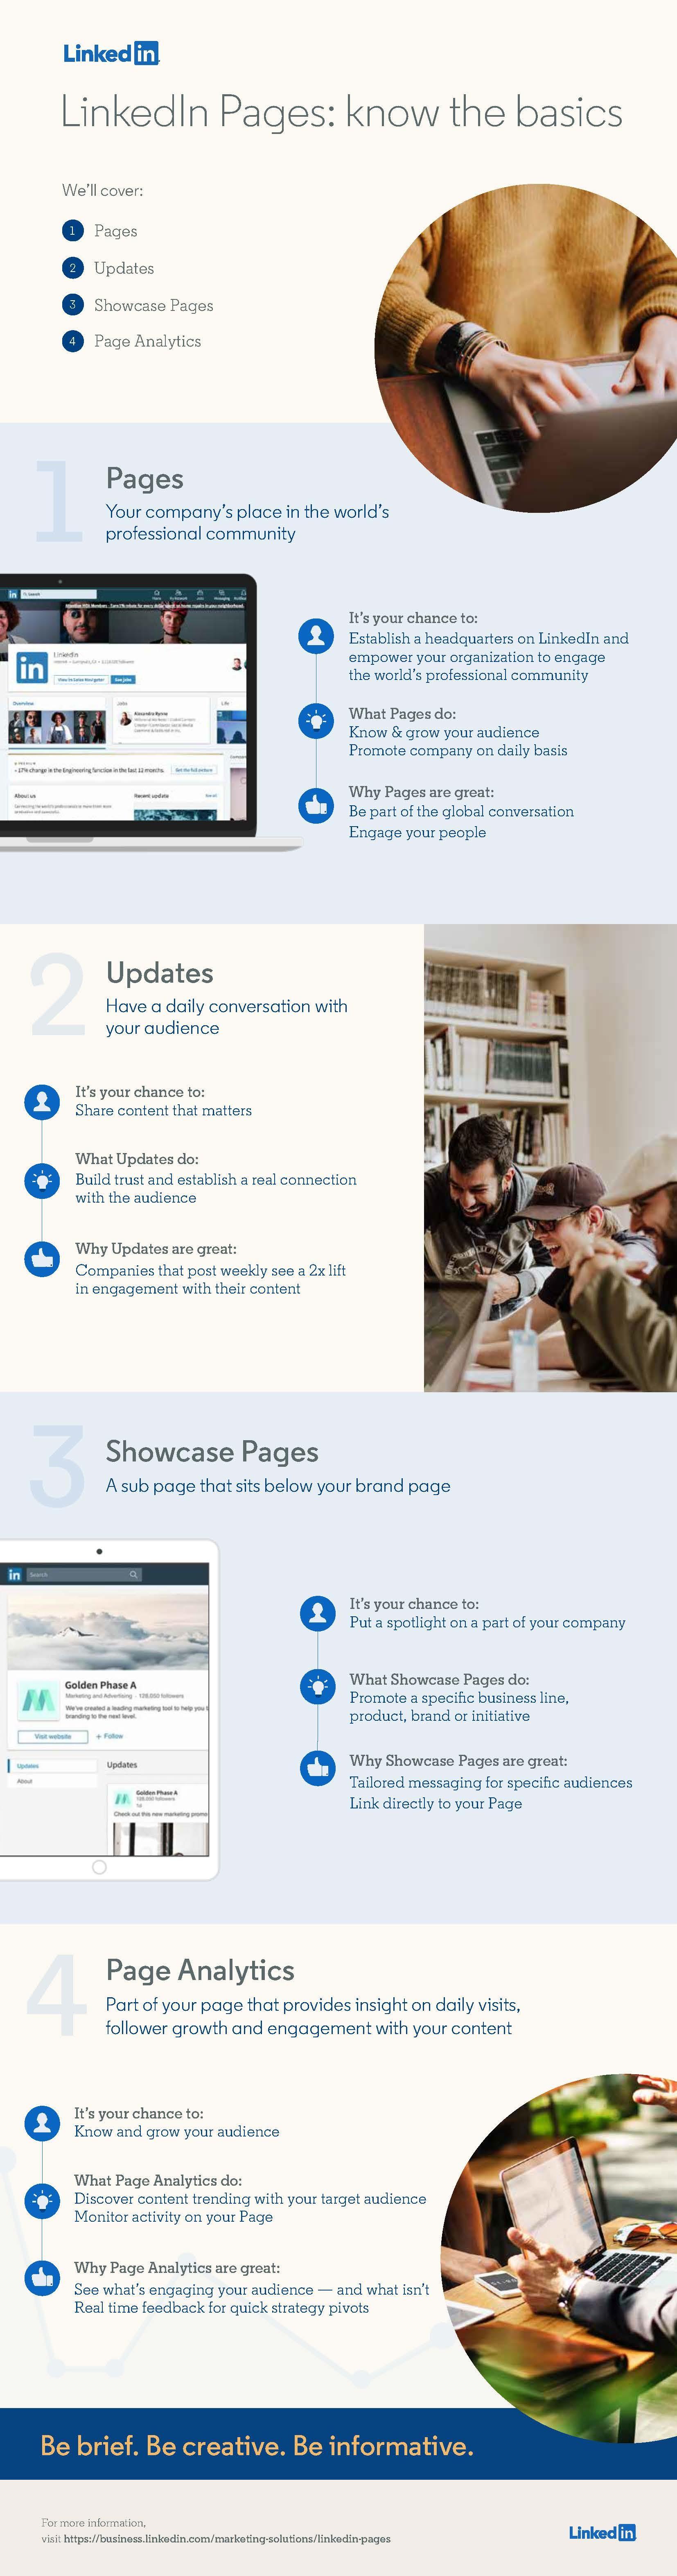 LinkedIn Pages - Basics